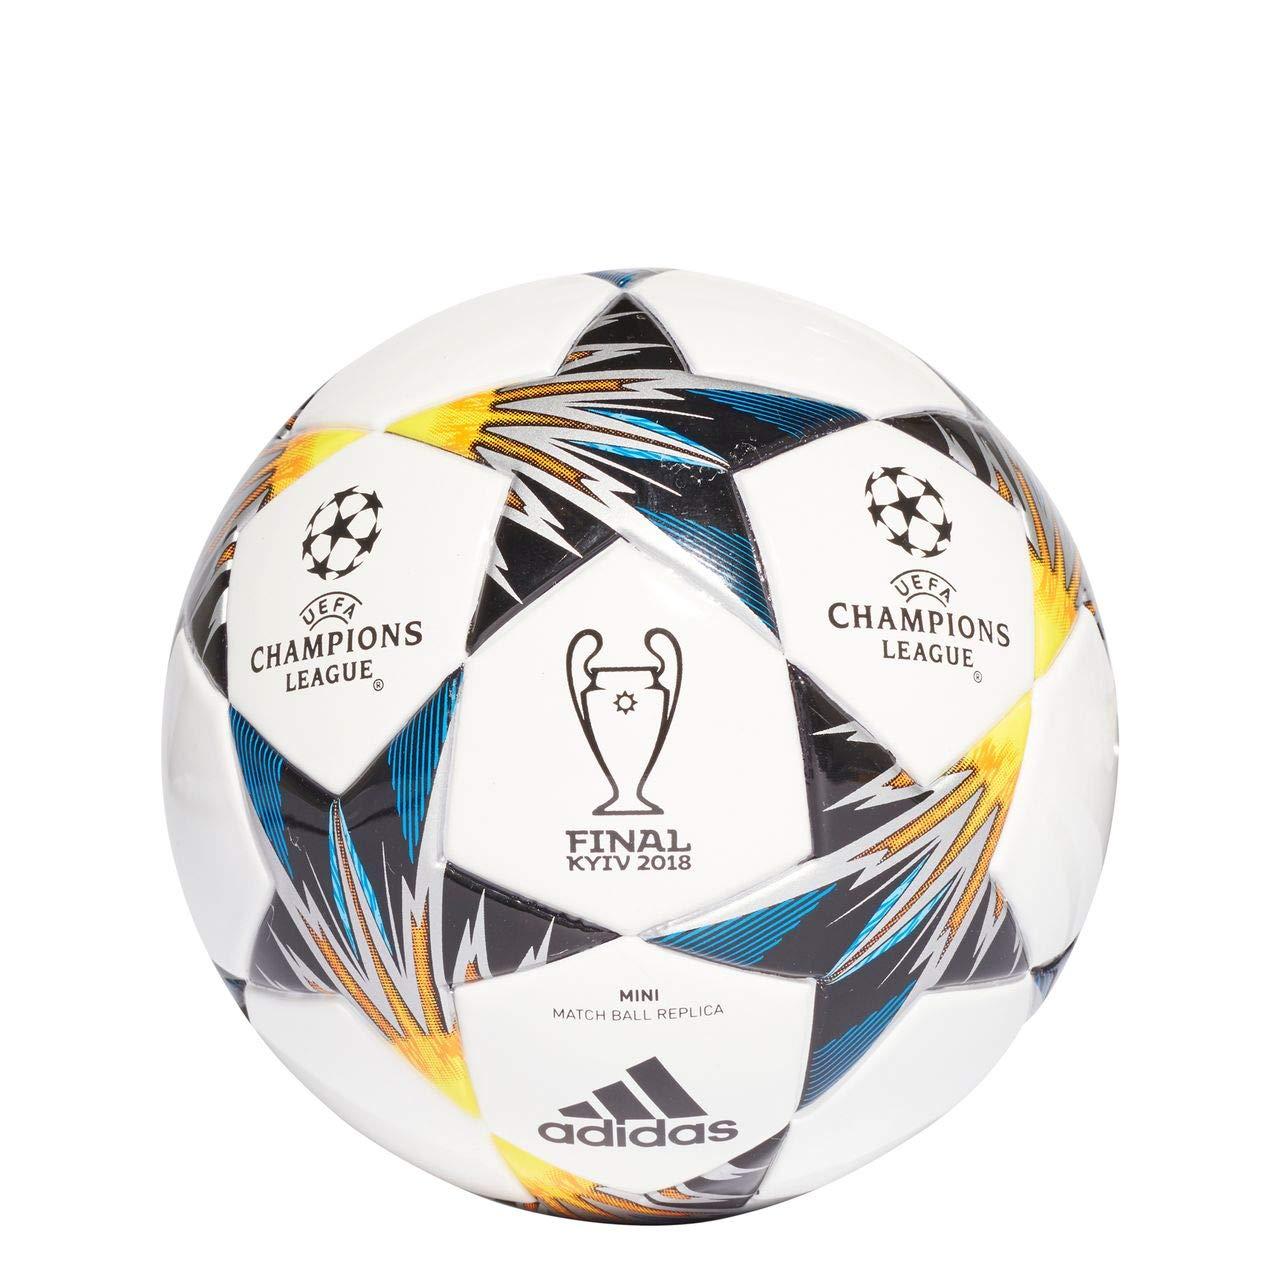 adidas Finalekiev Mini Balón, Hombre, (Blanco/Negro/Amasol/Azul ...